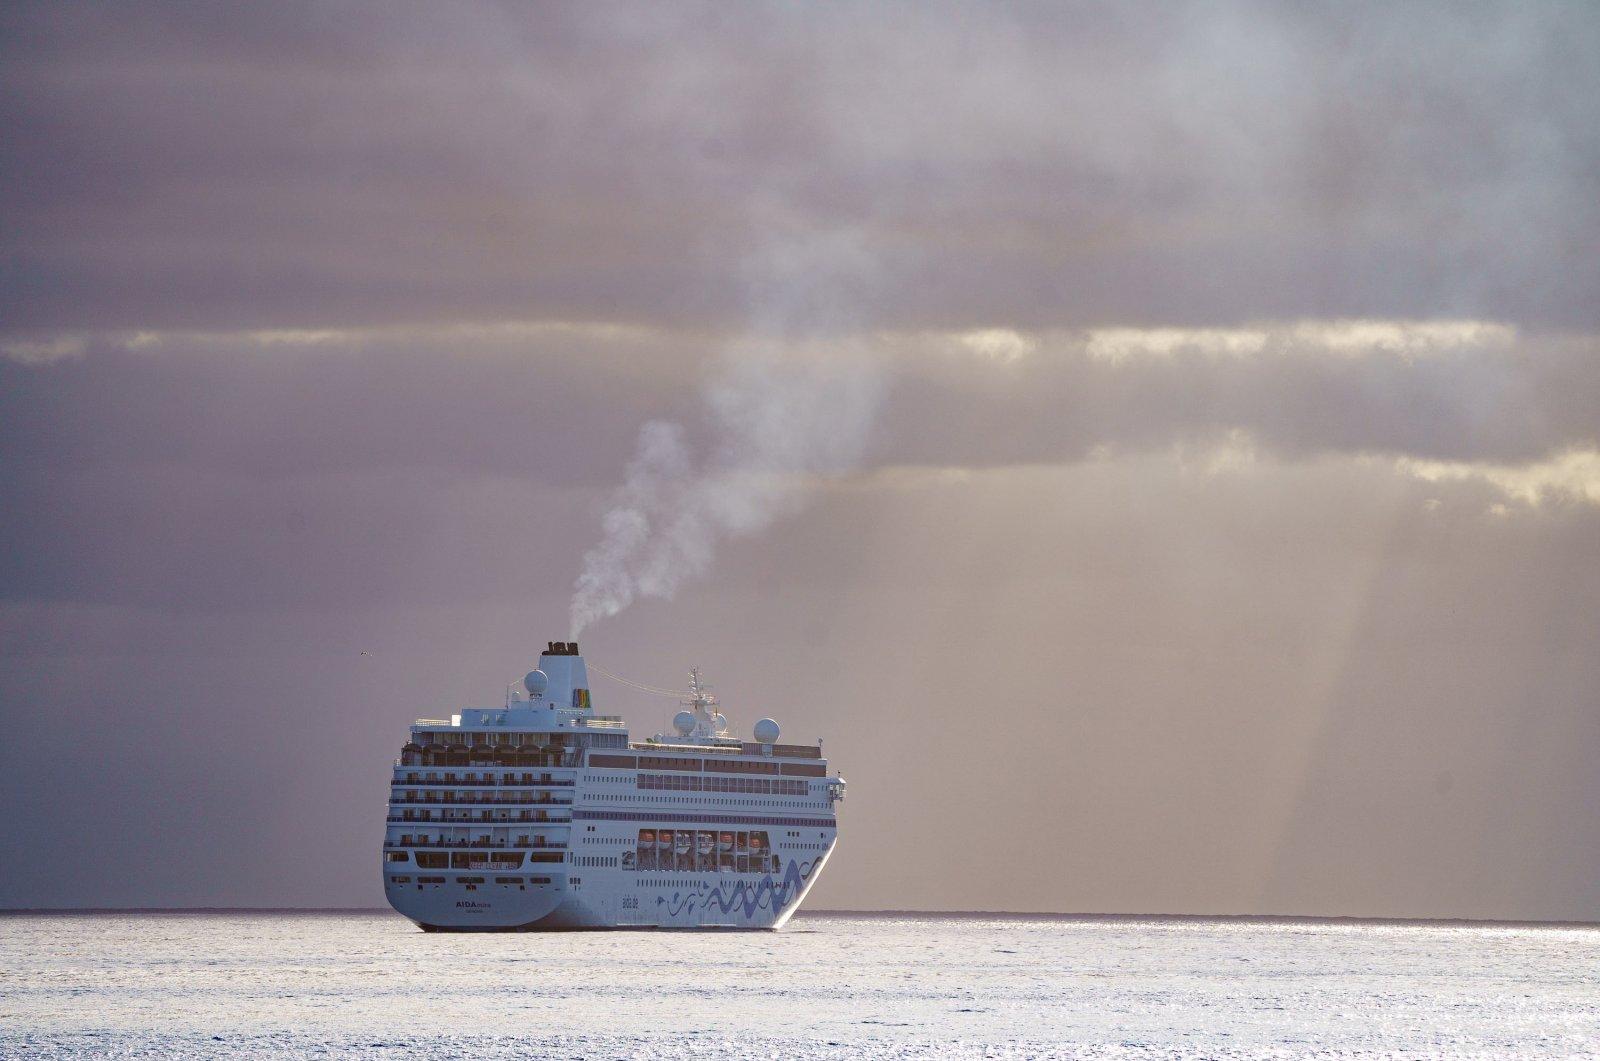 A cruise ship is seen anchored in Santa Cruz de Tenerife, Canary Islands, Spain, April 28, 2021. (EPA File Photo)